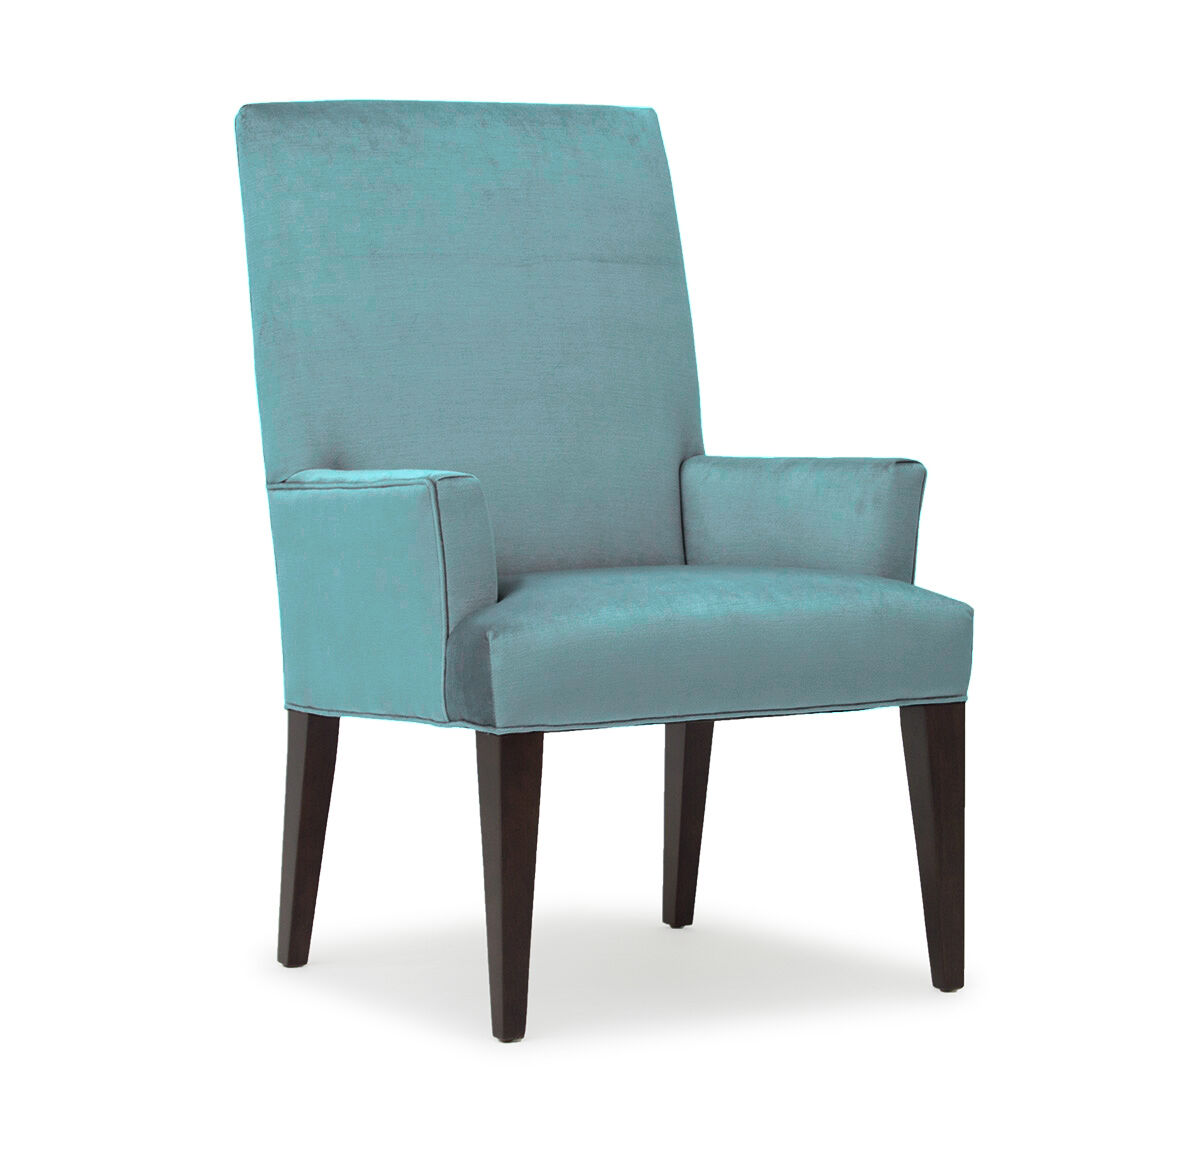 Teal Arm Chair